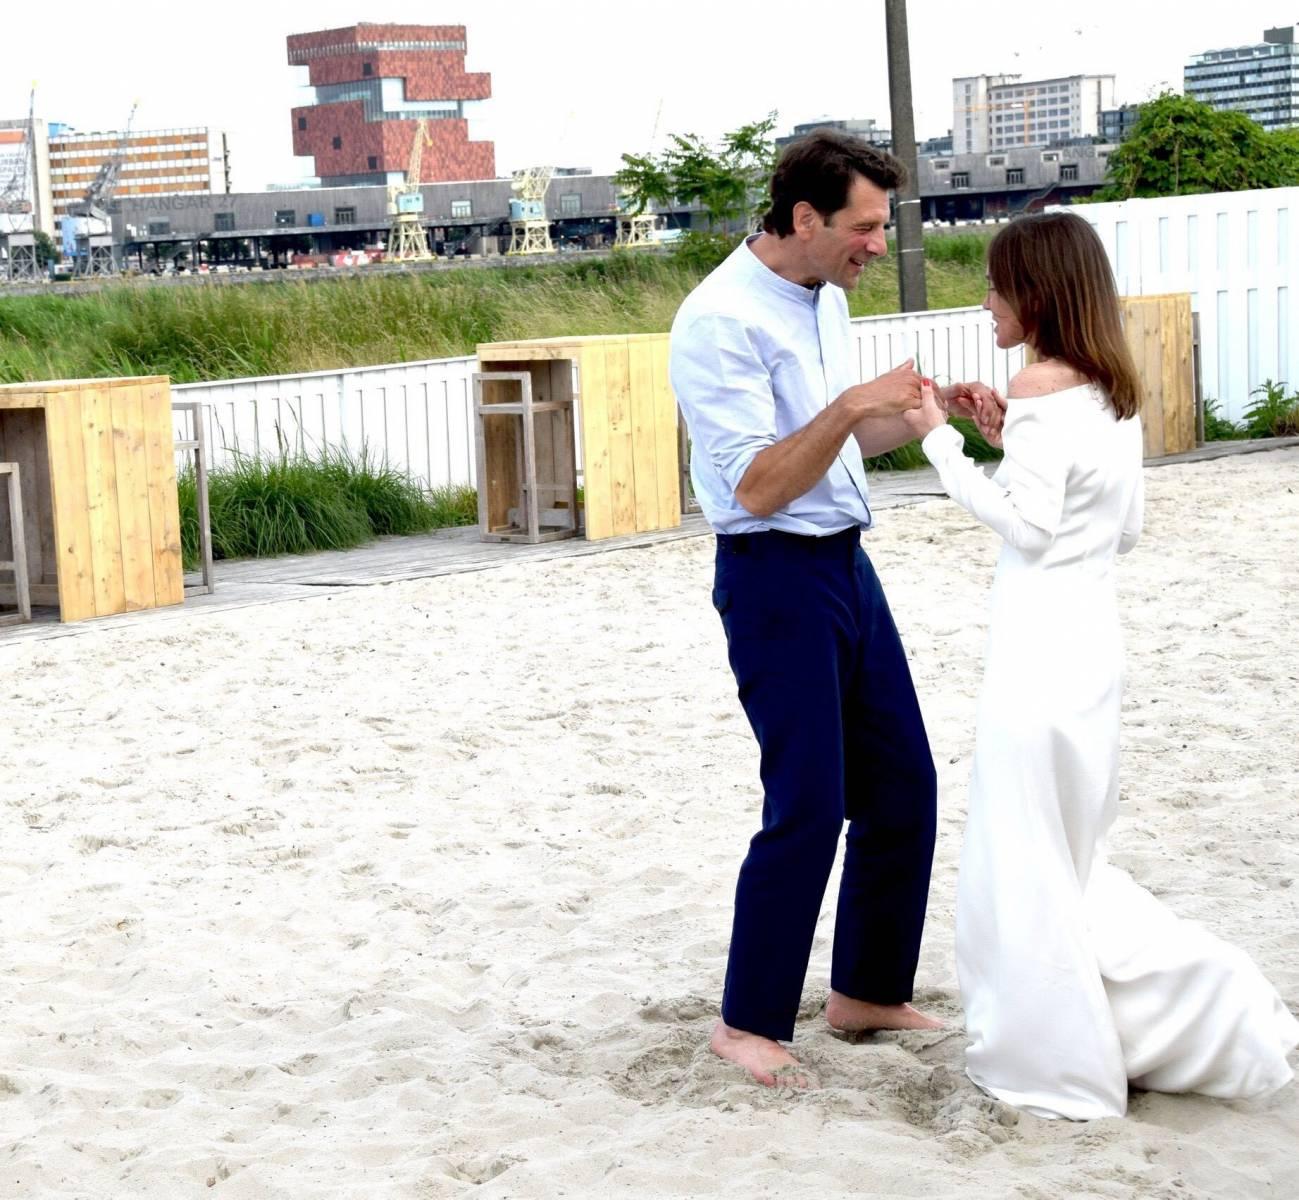 Strantwerpen - Feestzaal - Trouwzaal - Trouwen op het Strand - House of Weddings - 35